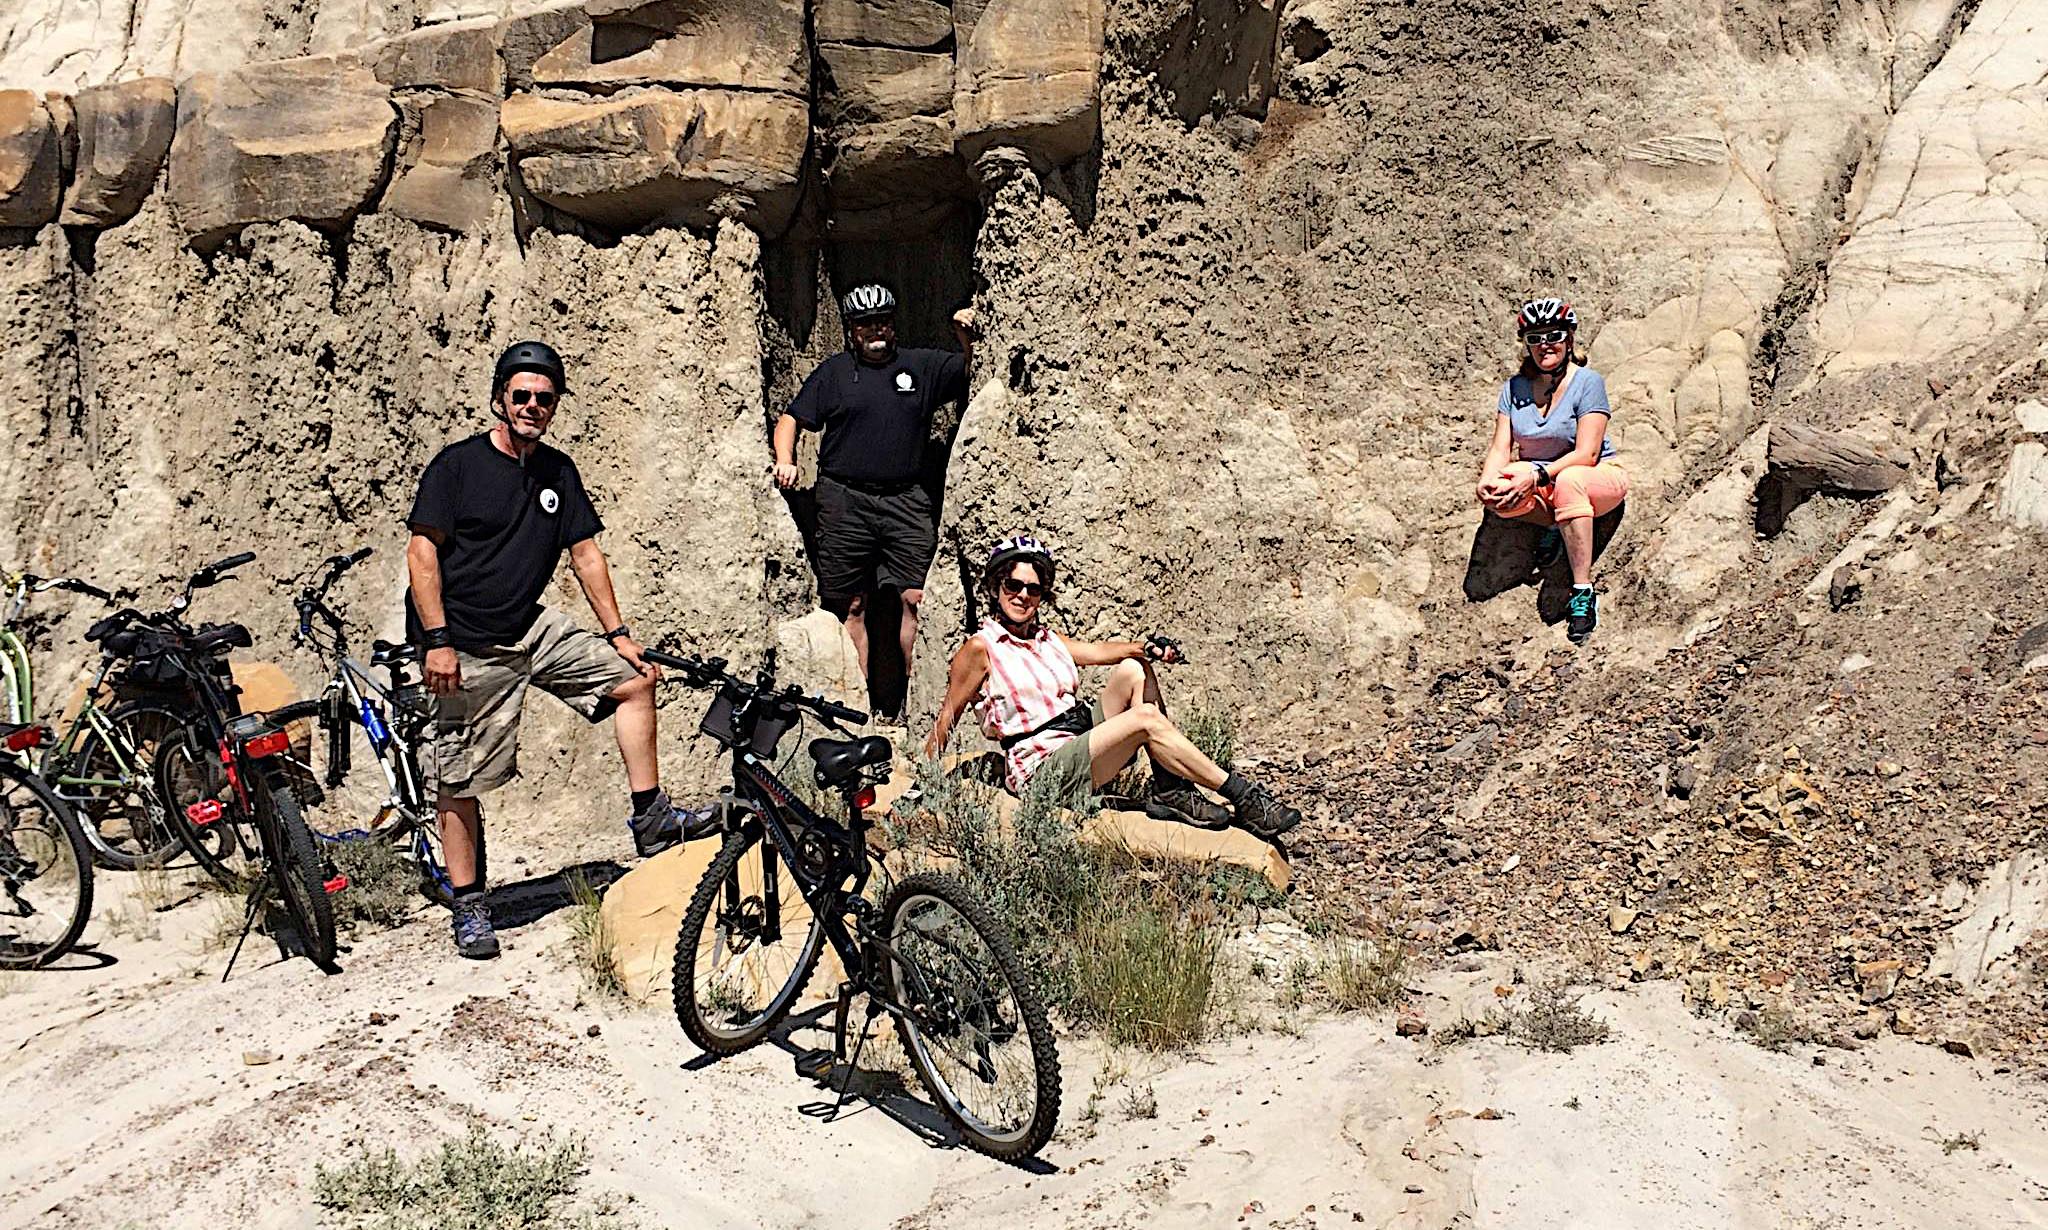 Group Riding, Touring Drumheller, Alberta